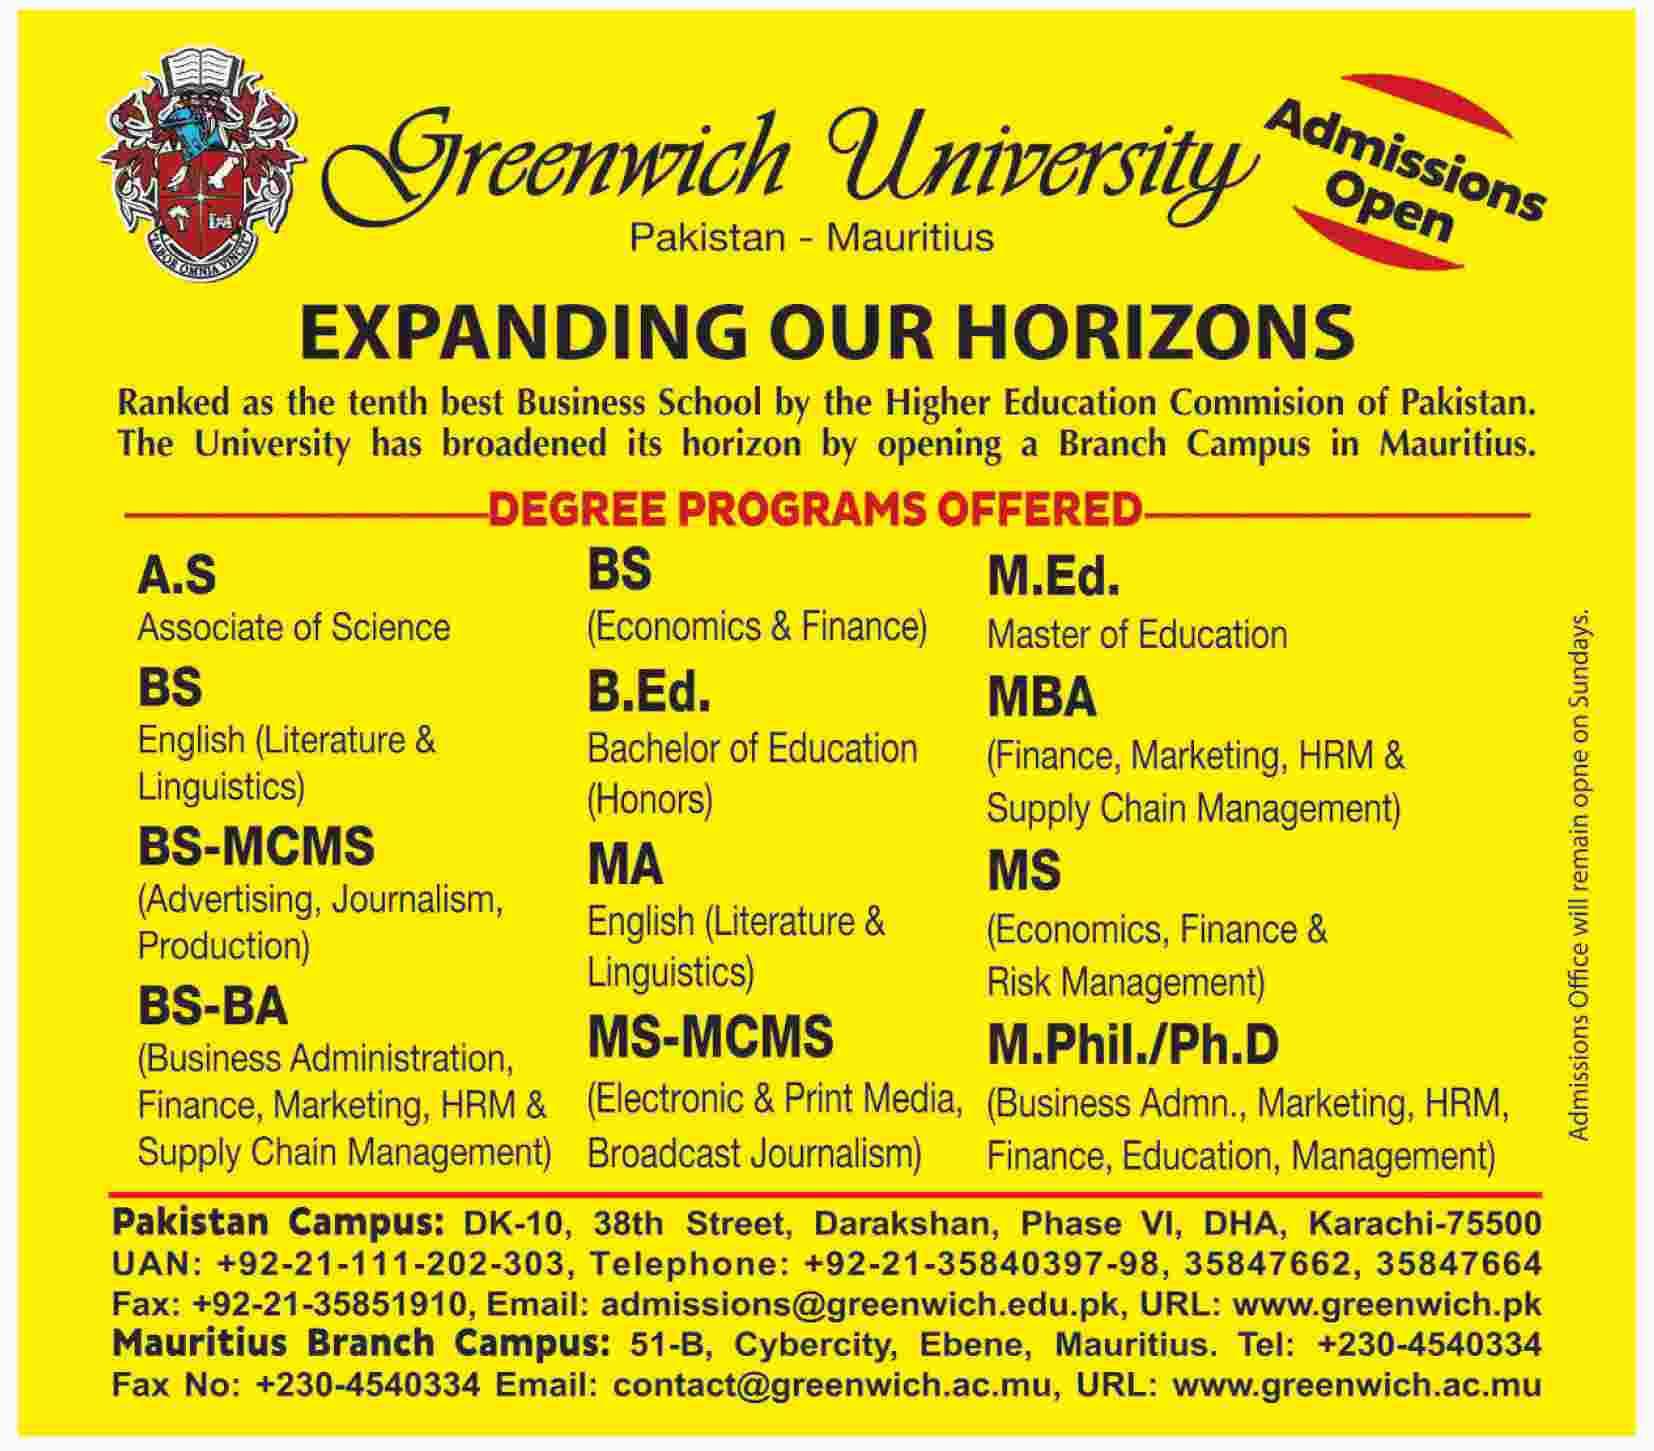 Greenwich University Karachi Admissions 2018 Last Date Apply Online